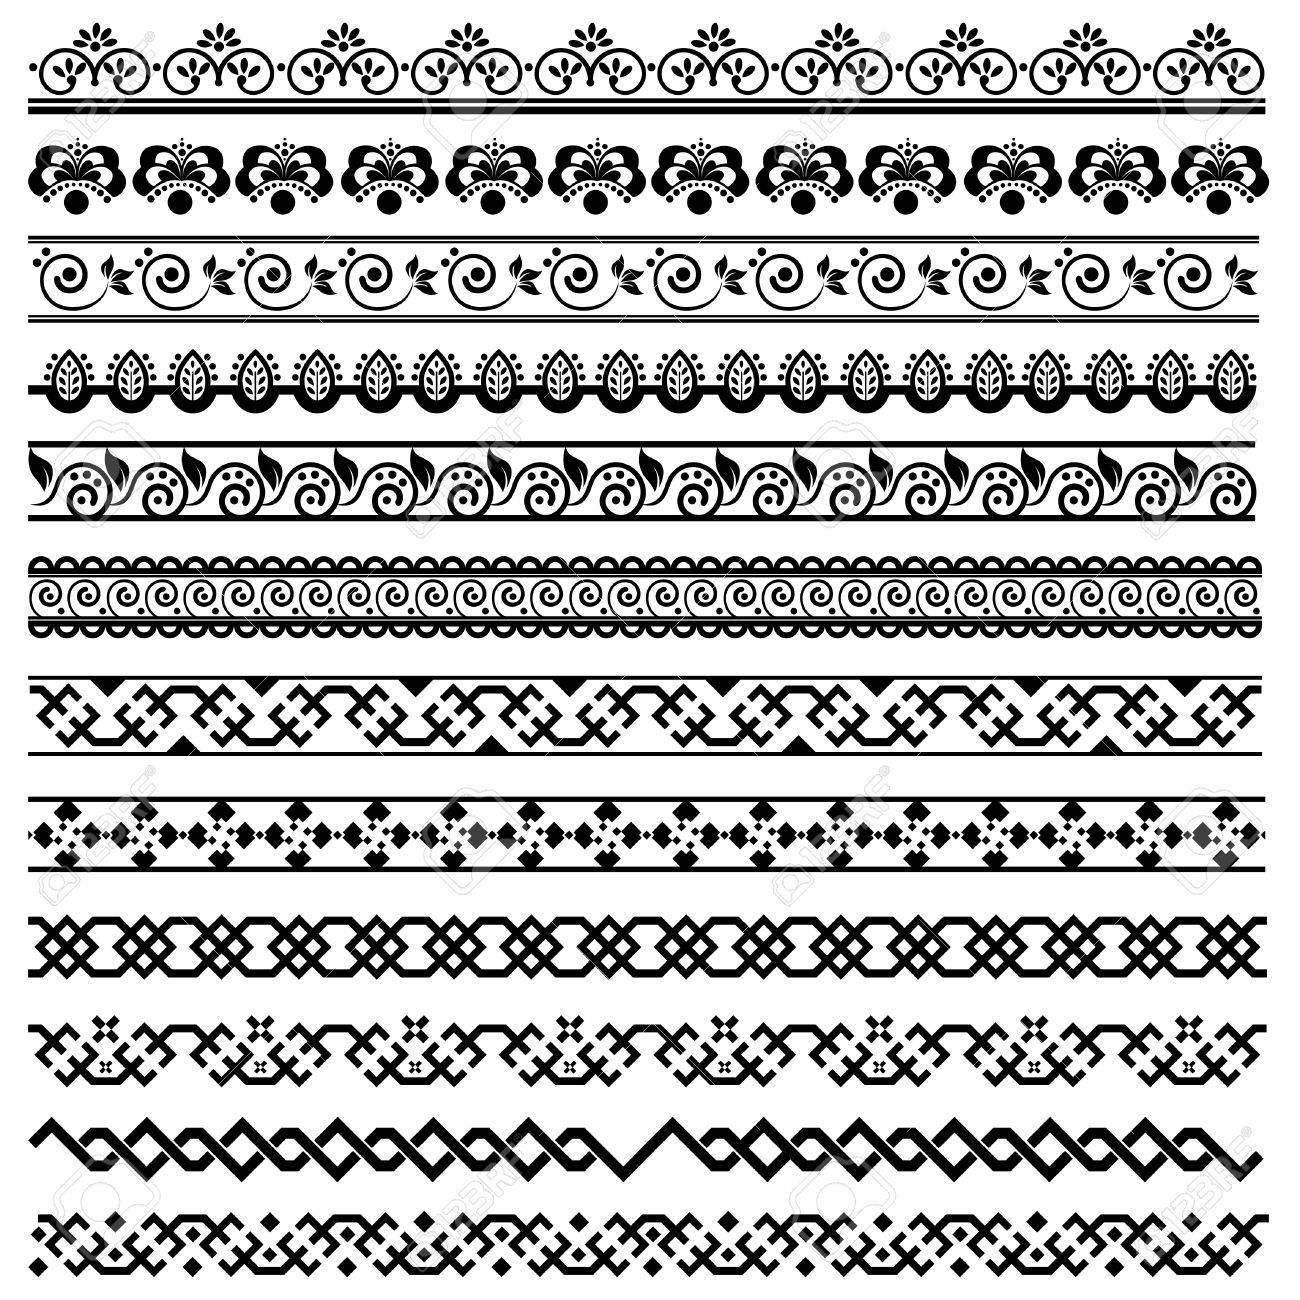 border decoration design elements Stock Vector - 9148449